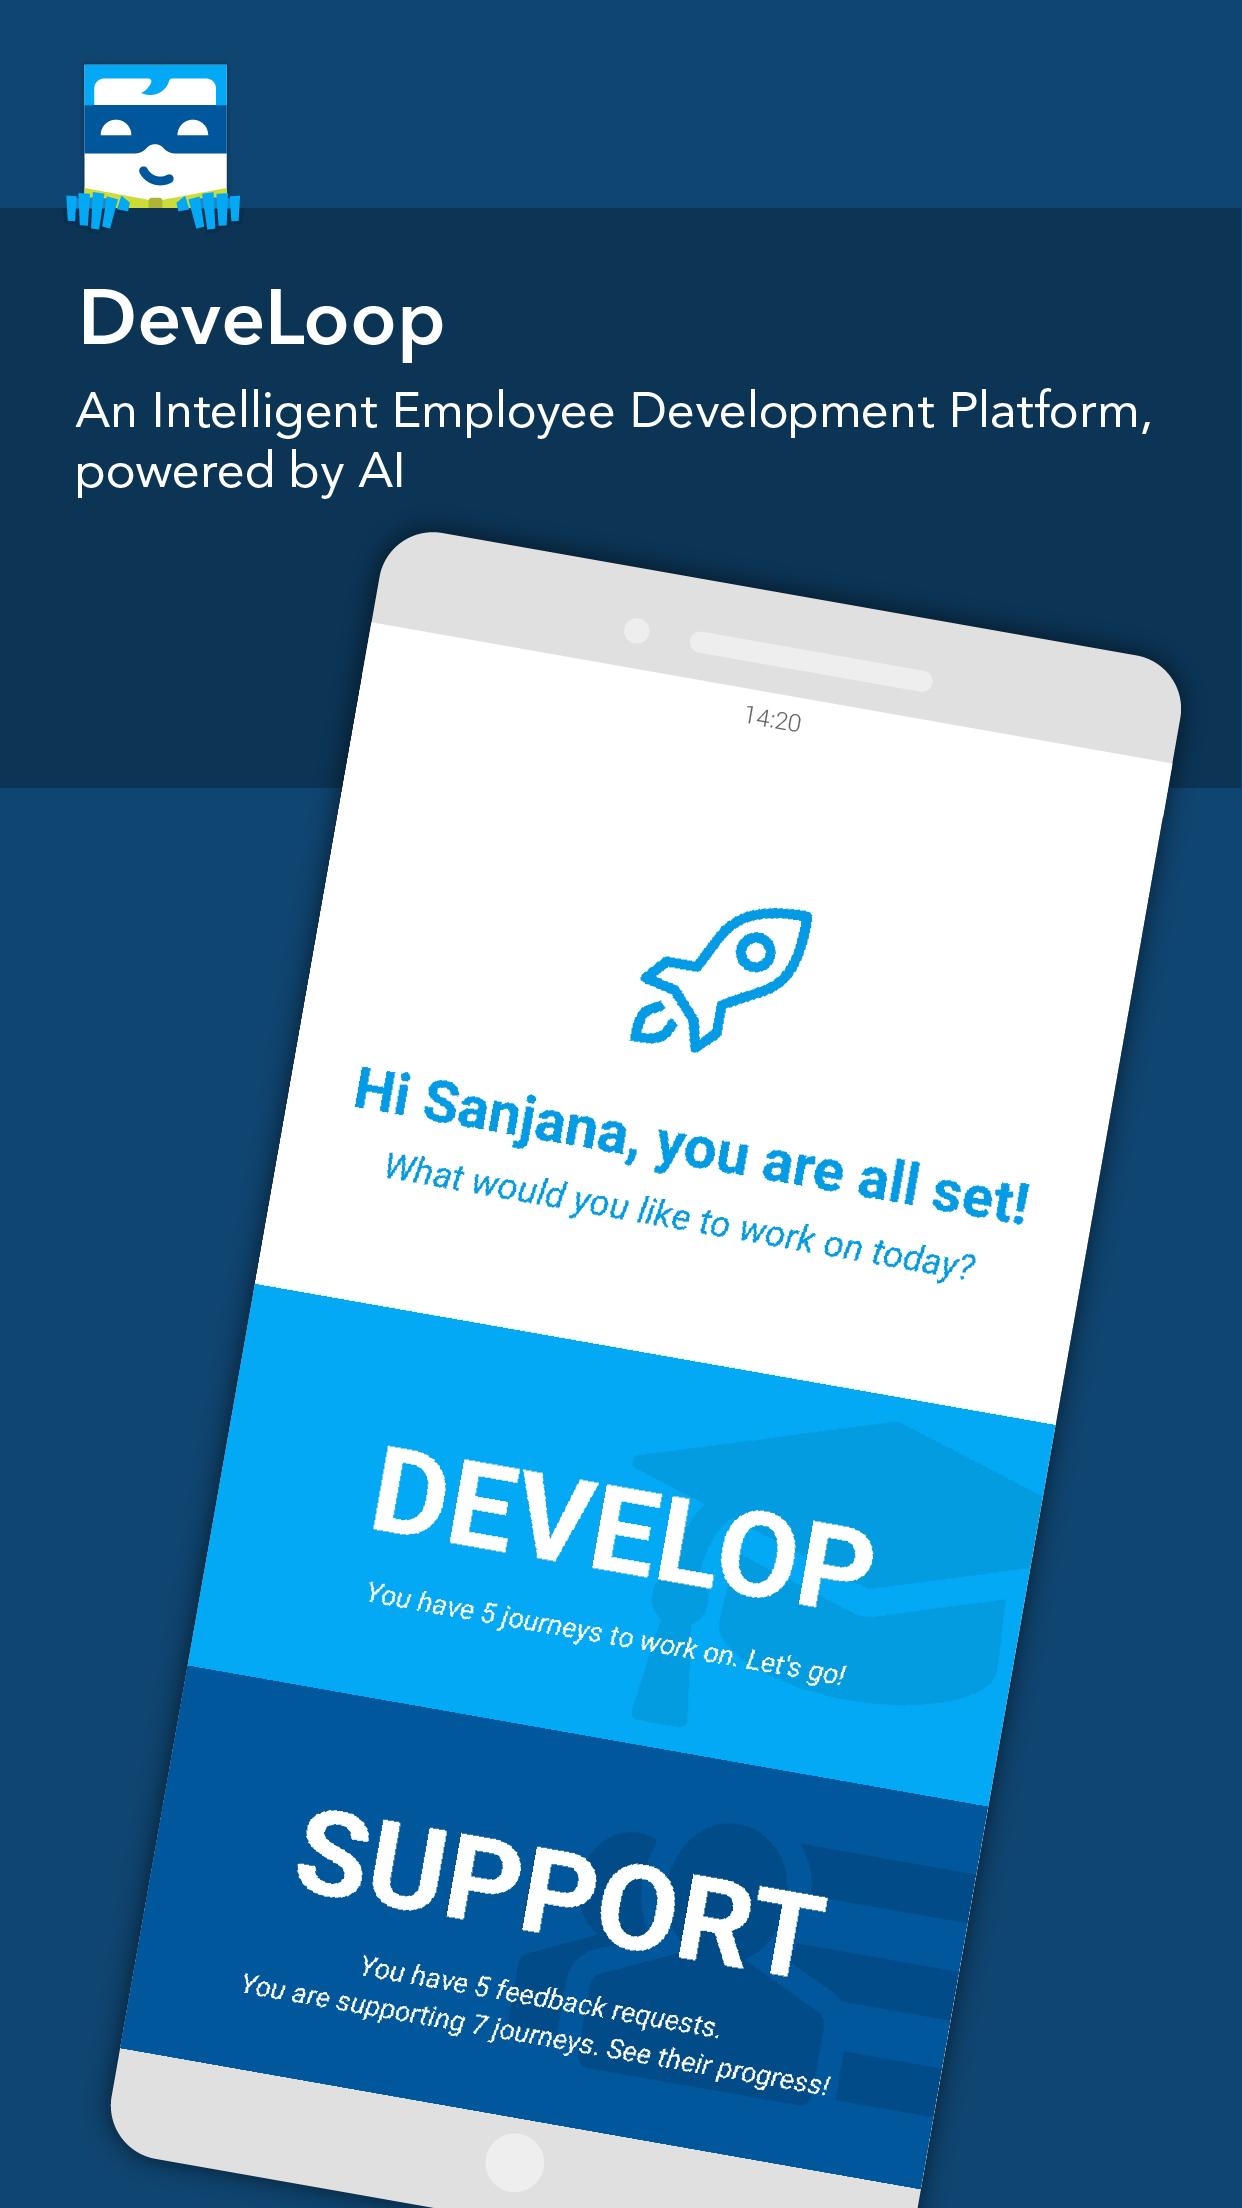 Custom employee development programs via mobile device